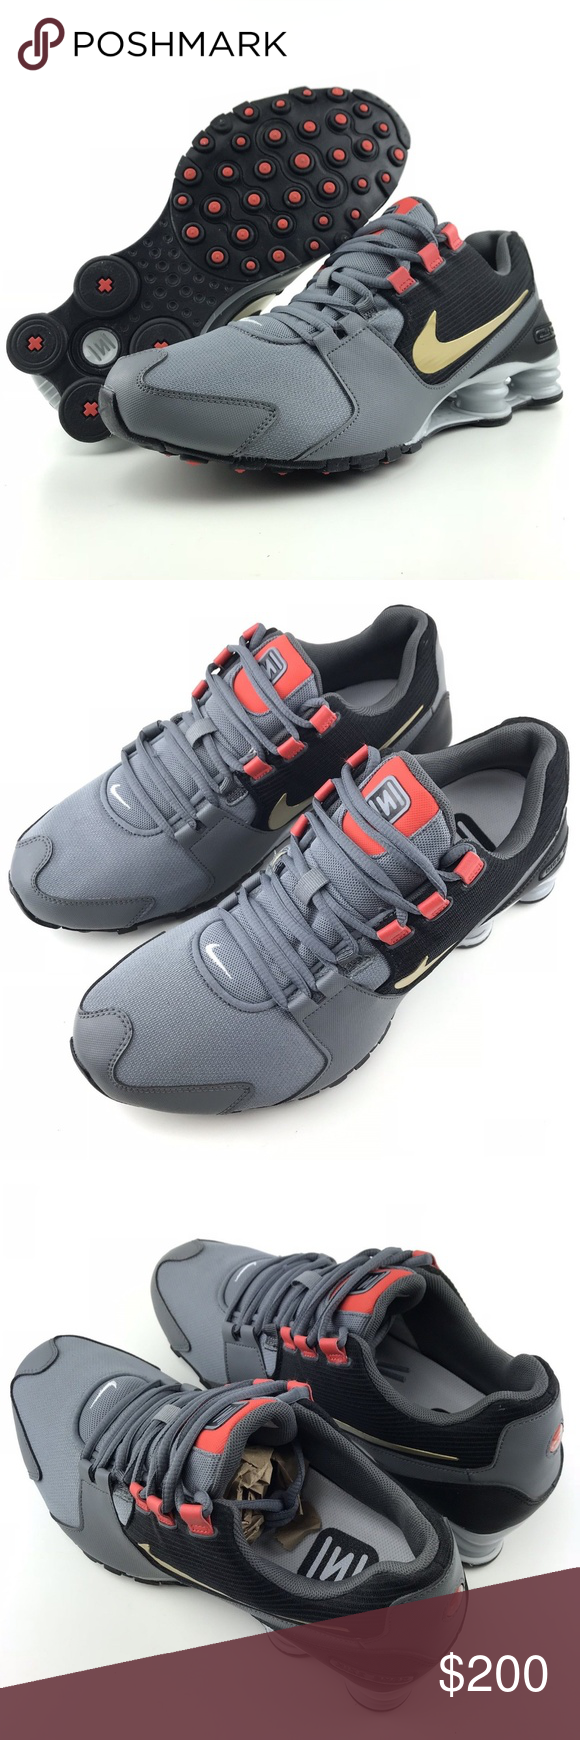 a84c78c86bd3fd ... clearance nike shox avenue premium running shoes nike shox 10.5 mens  avenue premium sneakers cool grey